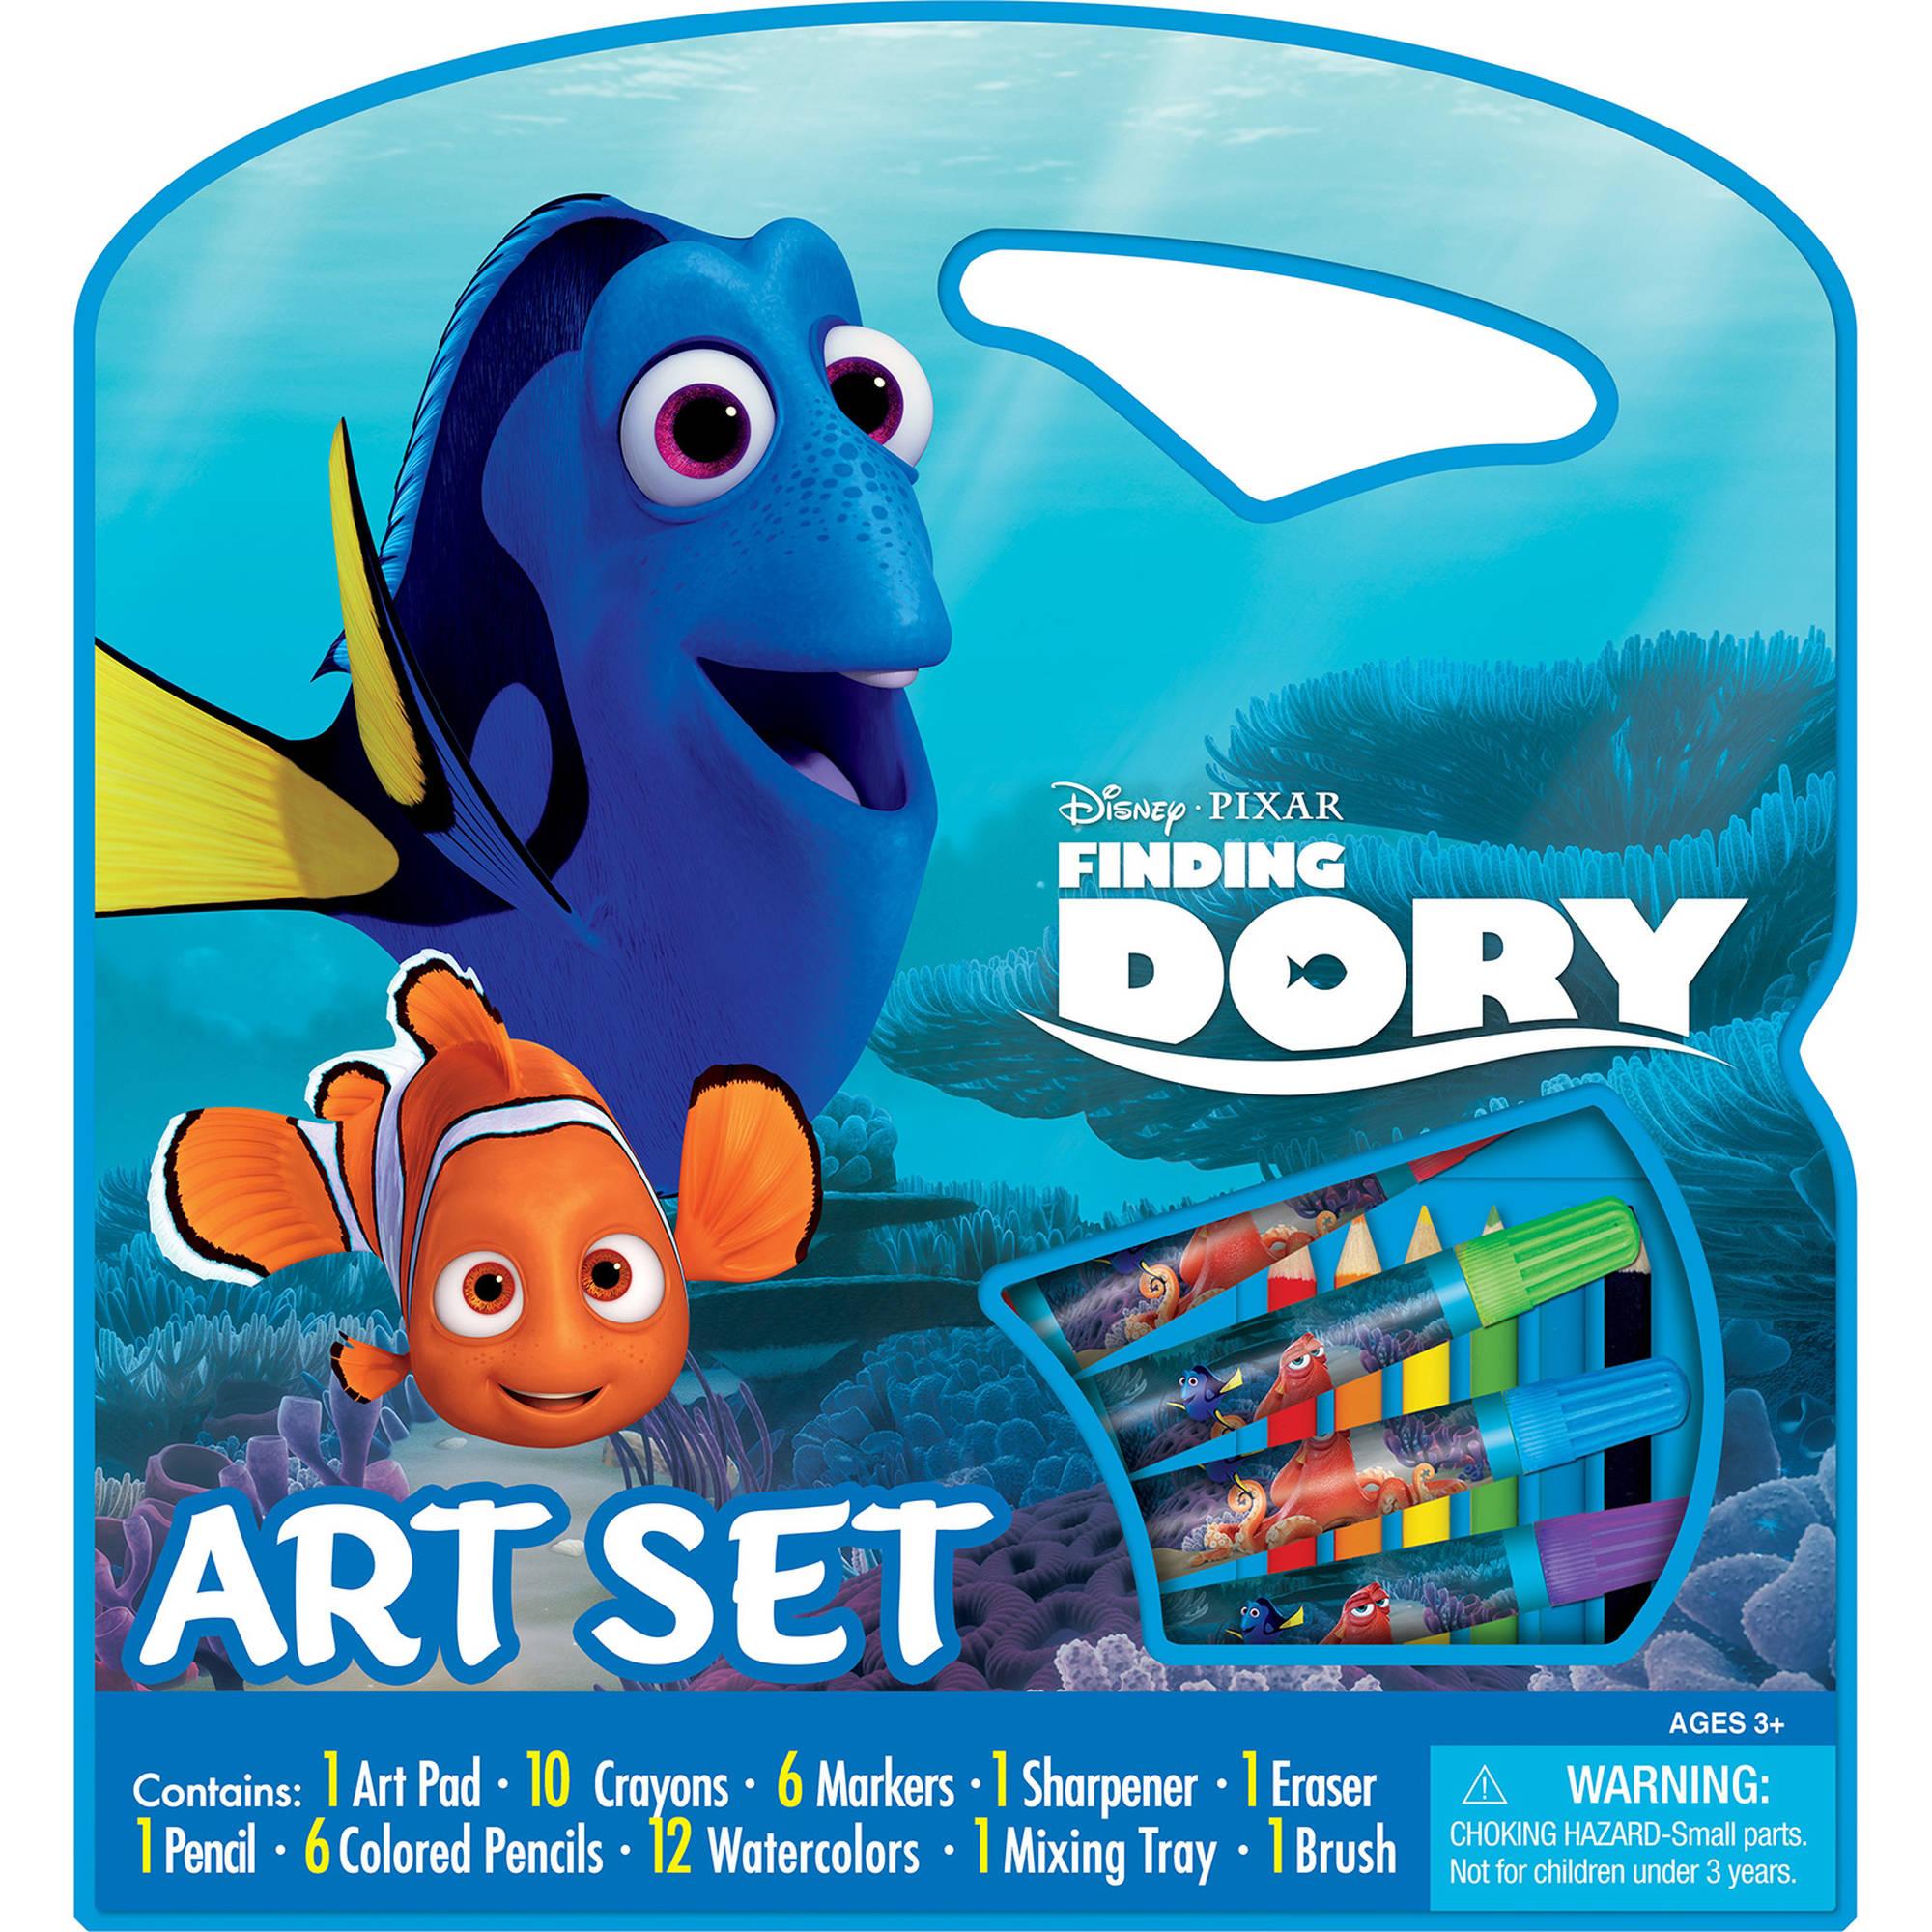 Bendon Disney PIXAR Finding Dory Character Art Set